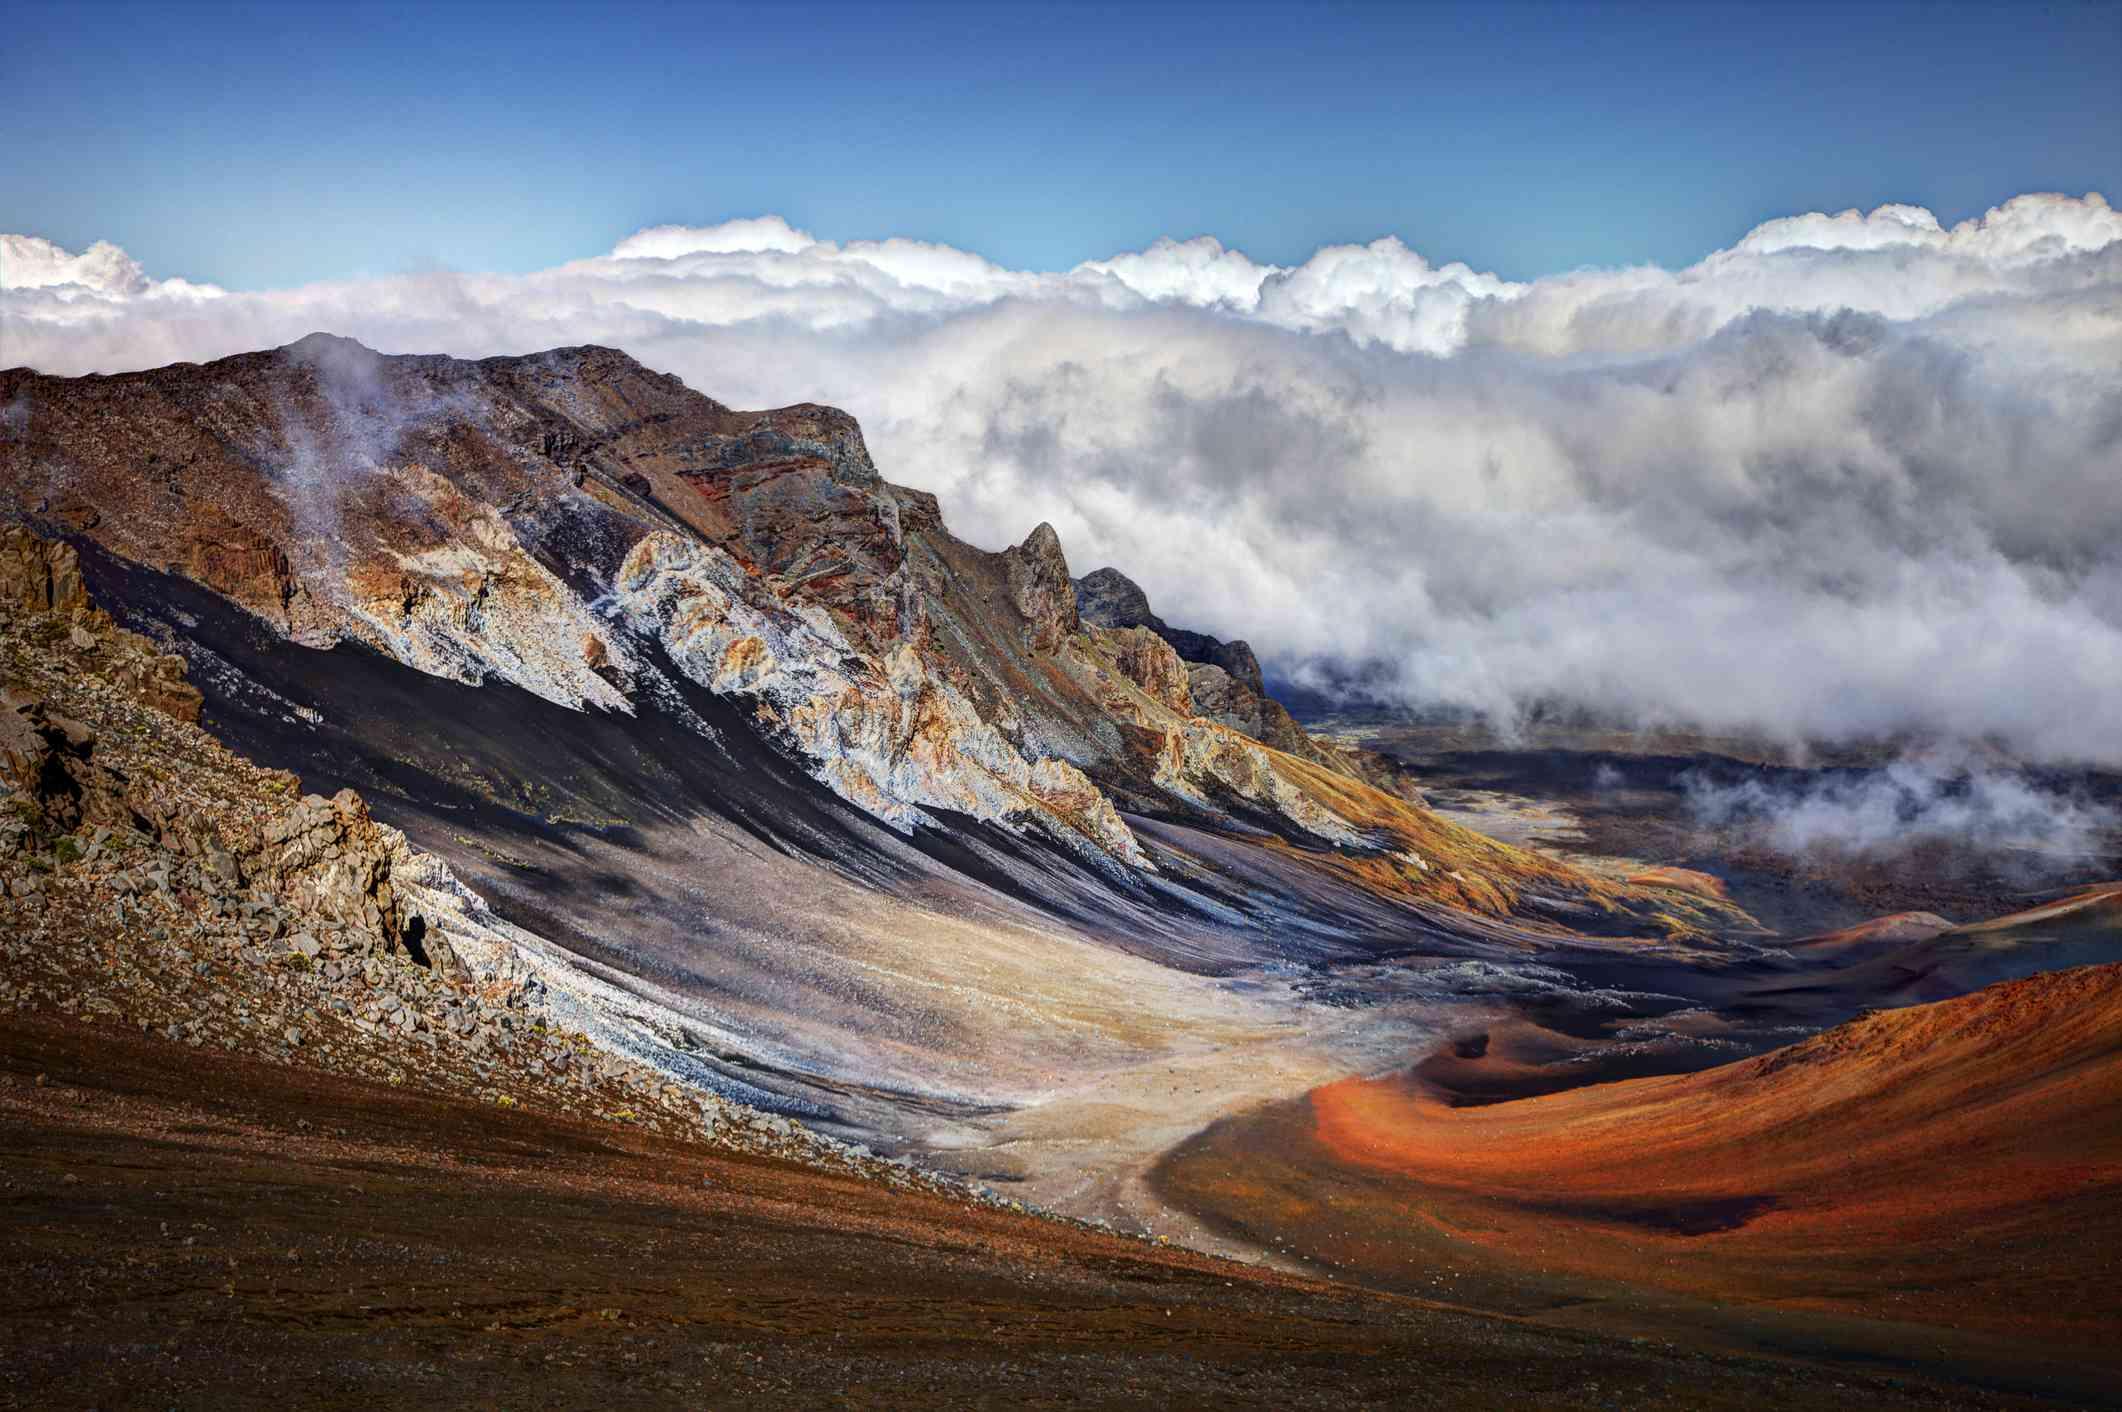 Sliding Sands Trail in Haleakala National Park